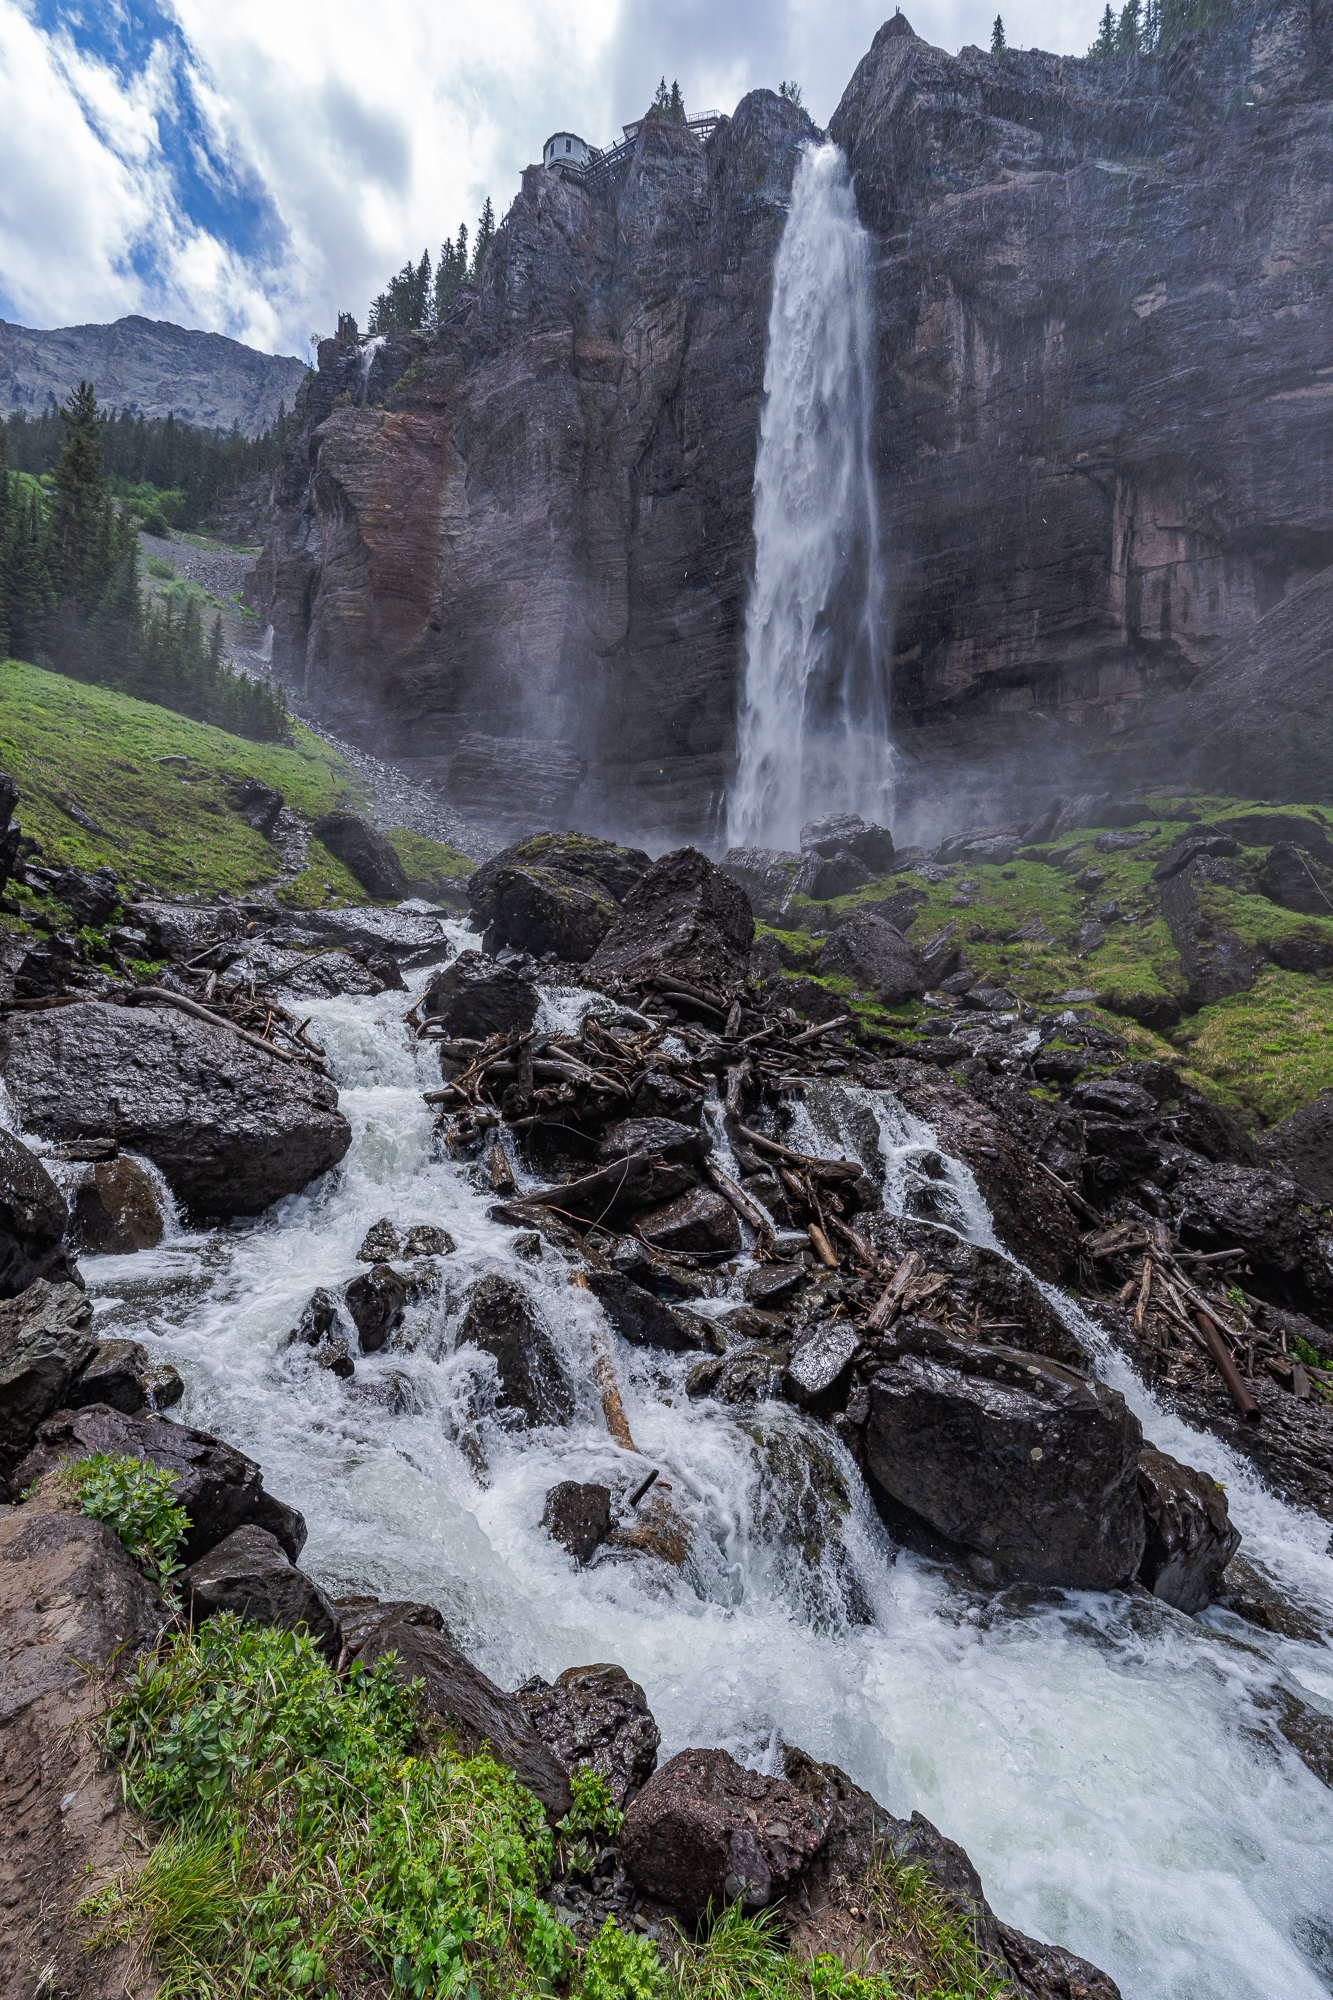 Bridal Veil Falls & Creek, Telluride, CO